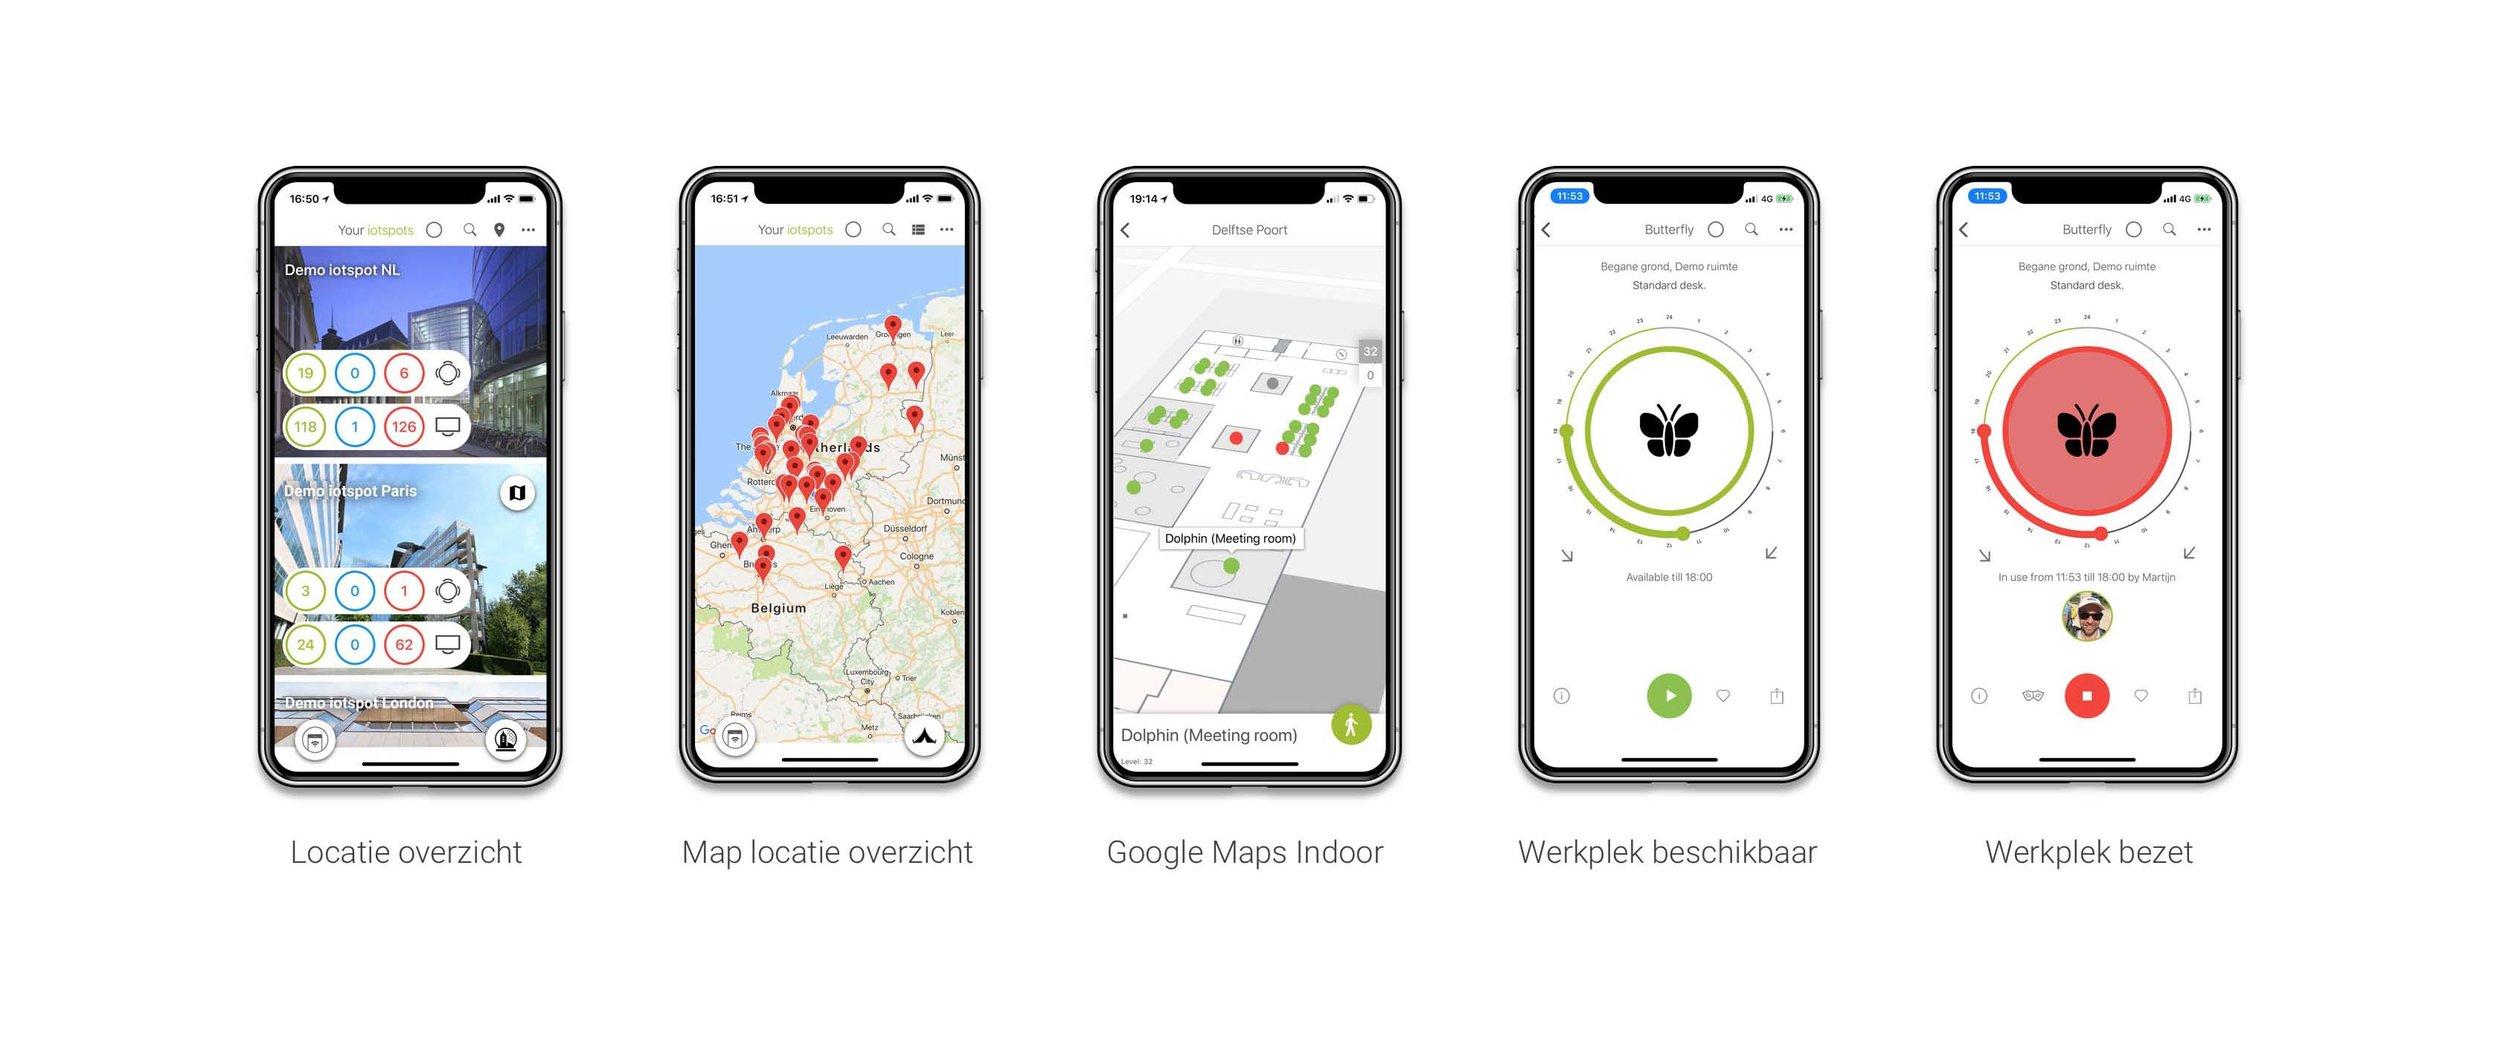 iotspot app overview NL.jpg